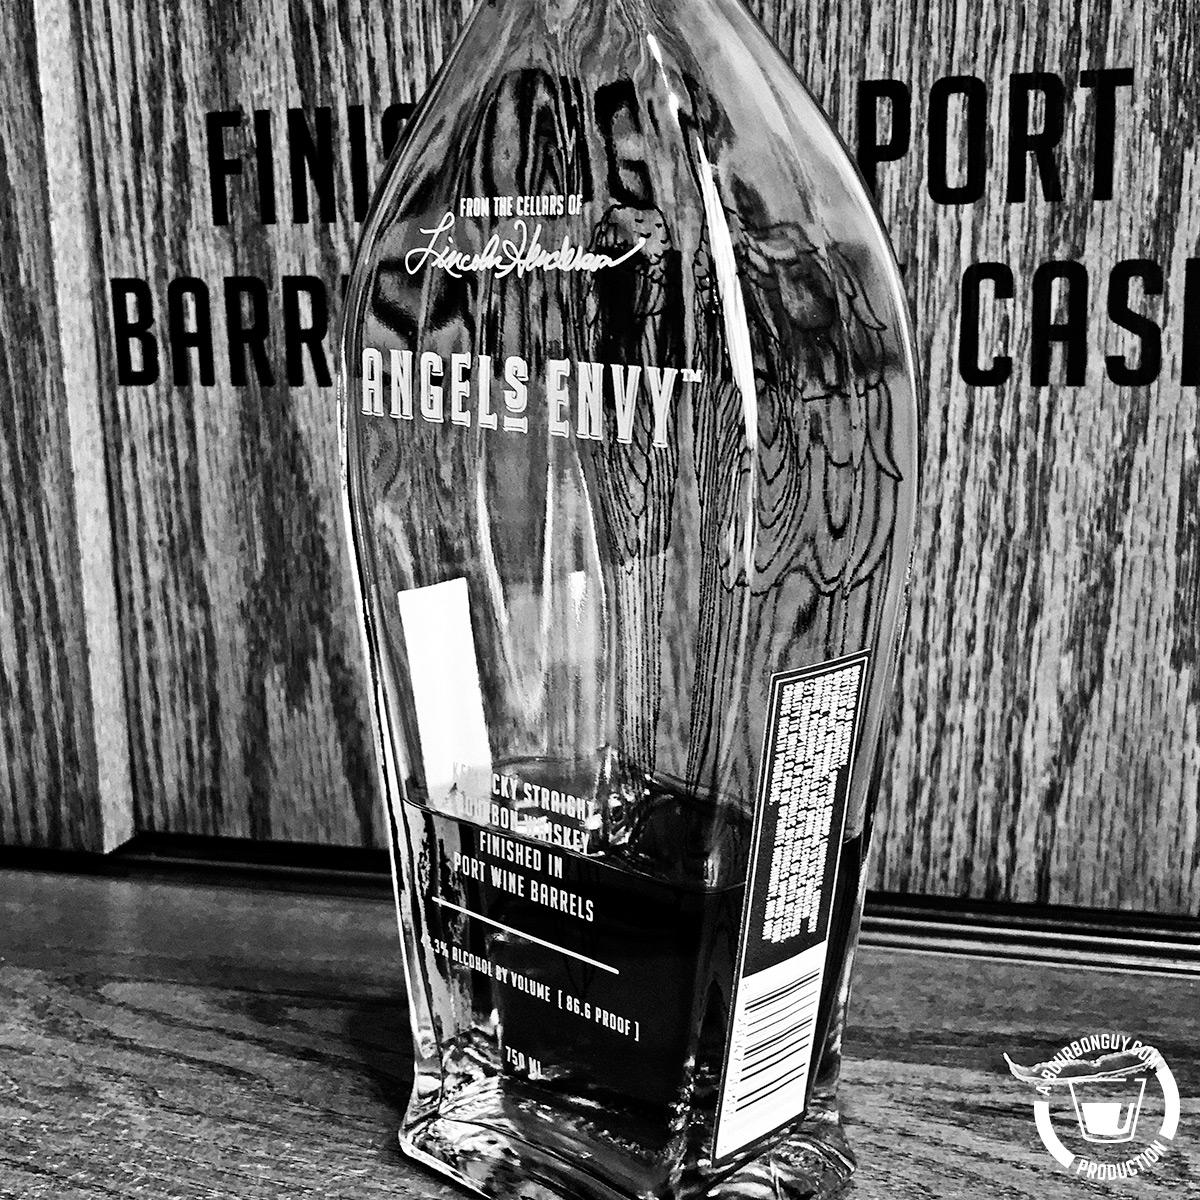 IMAGE: A bottle of Angel's Envy Bourbon